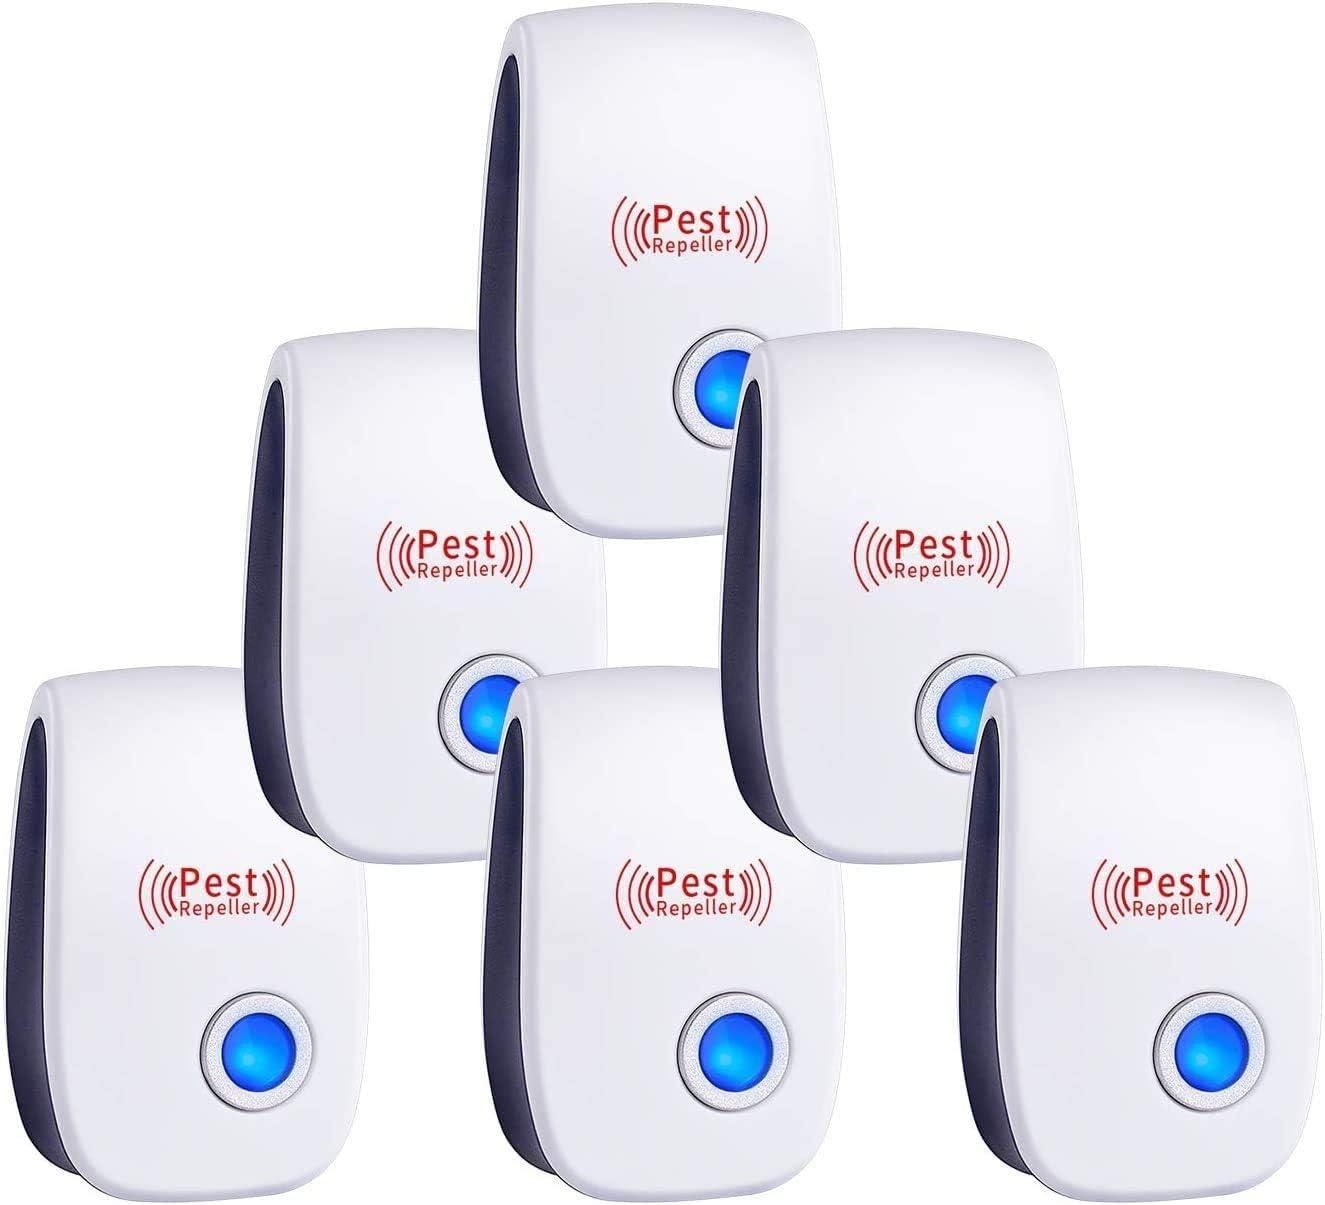 TOMPOL Ultrasonic Pest Repeller 6 Packs Pest Control Electronic Plug in Indoor Pest Repellent